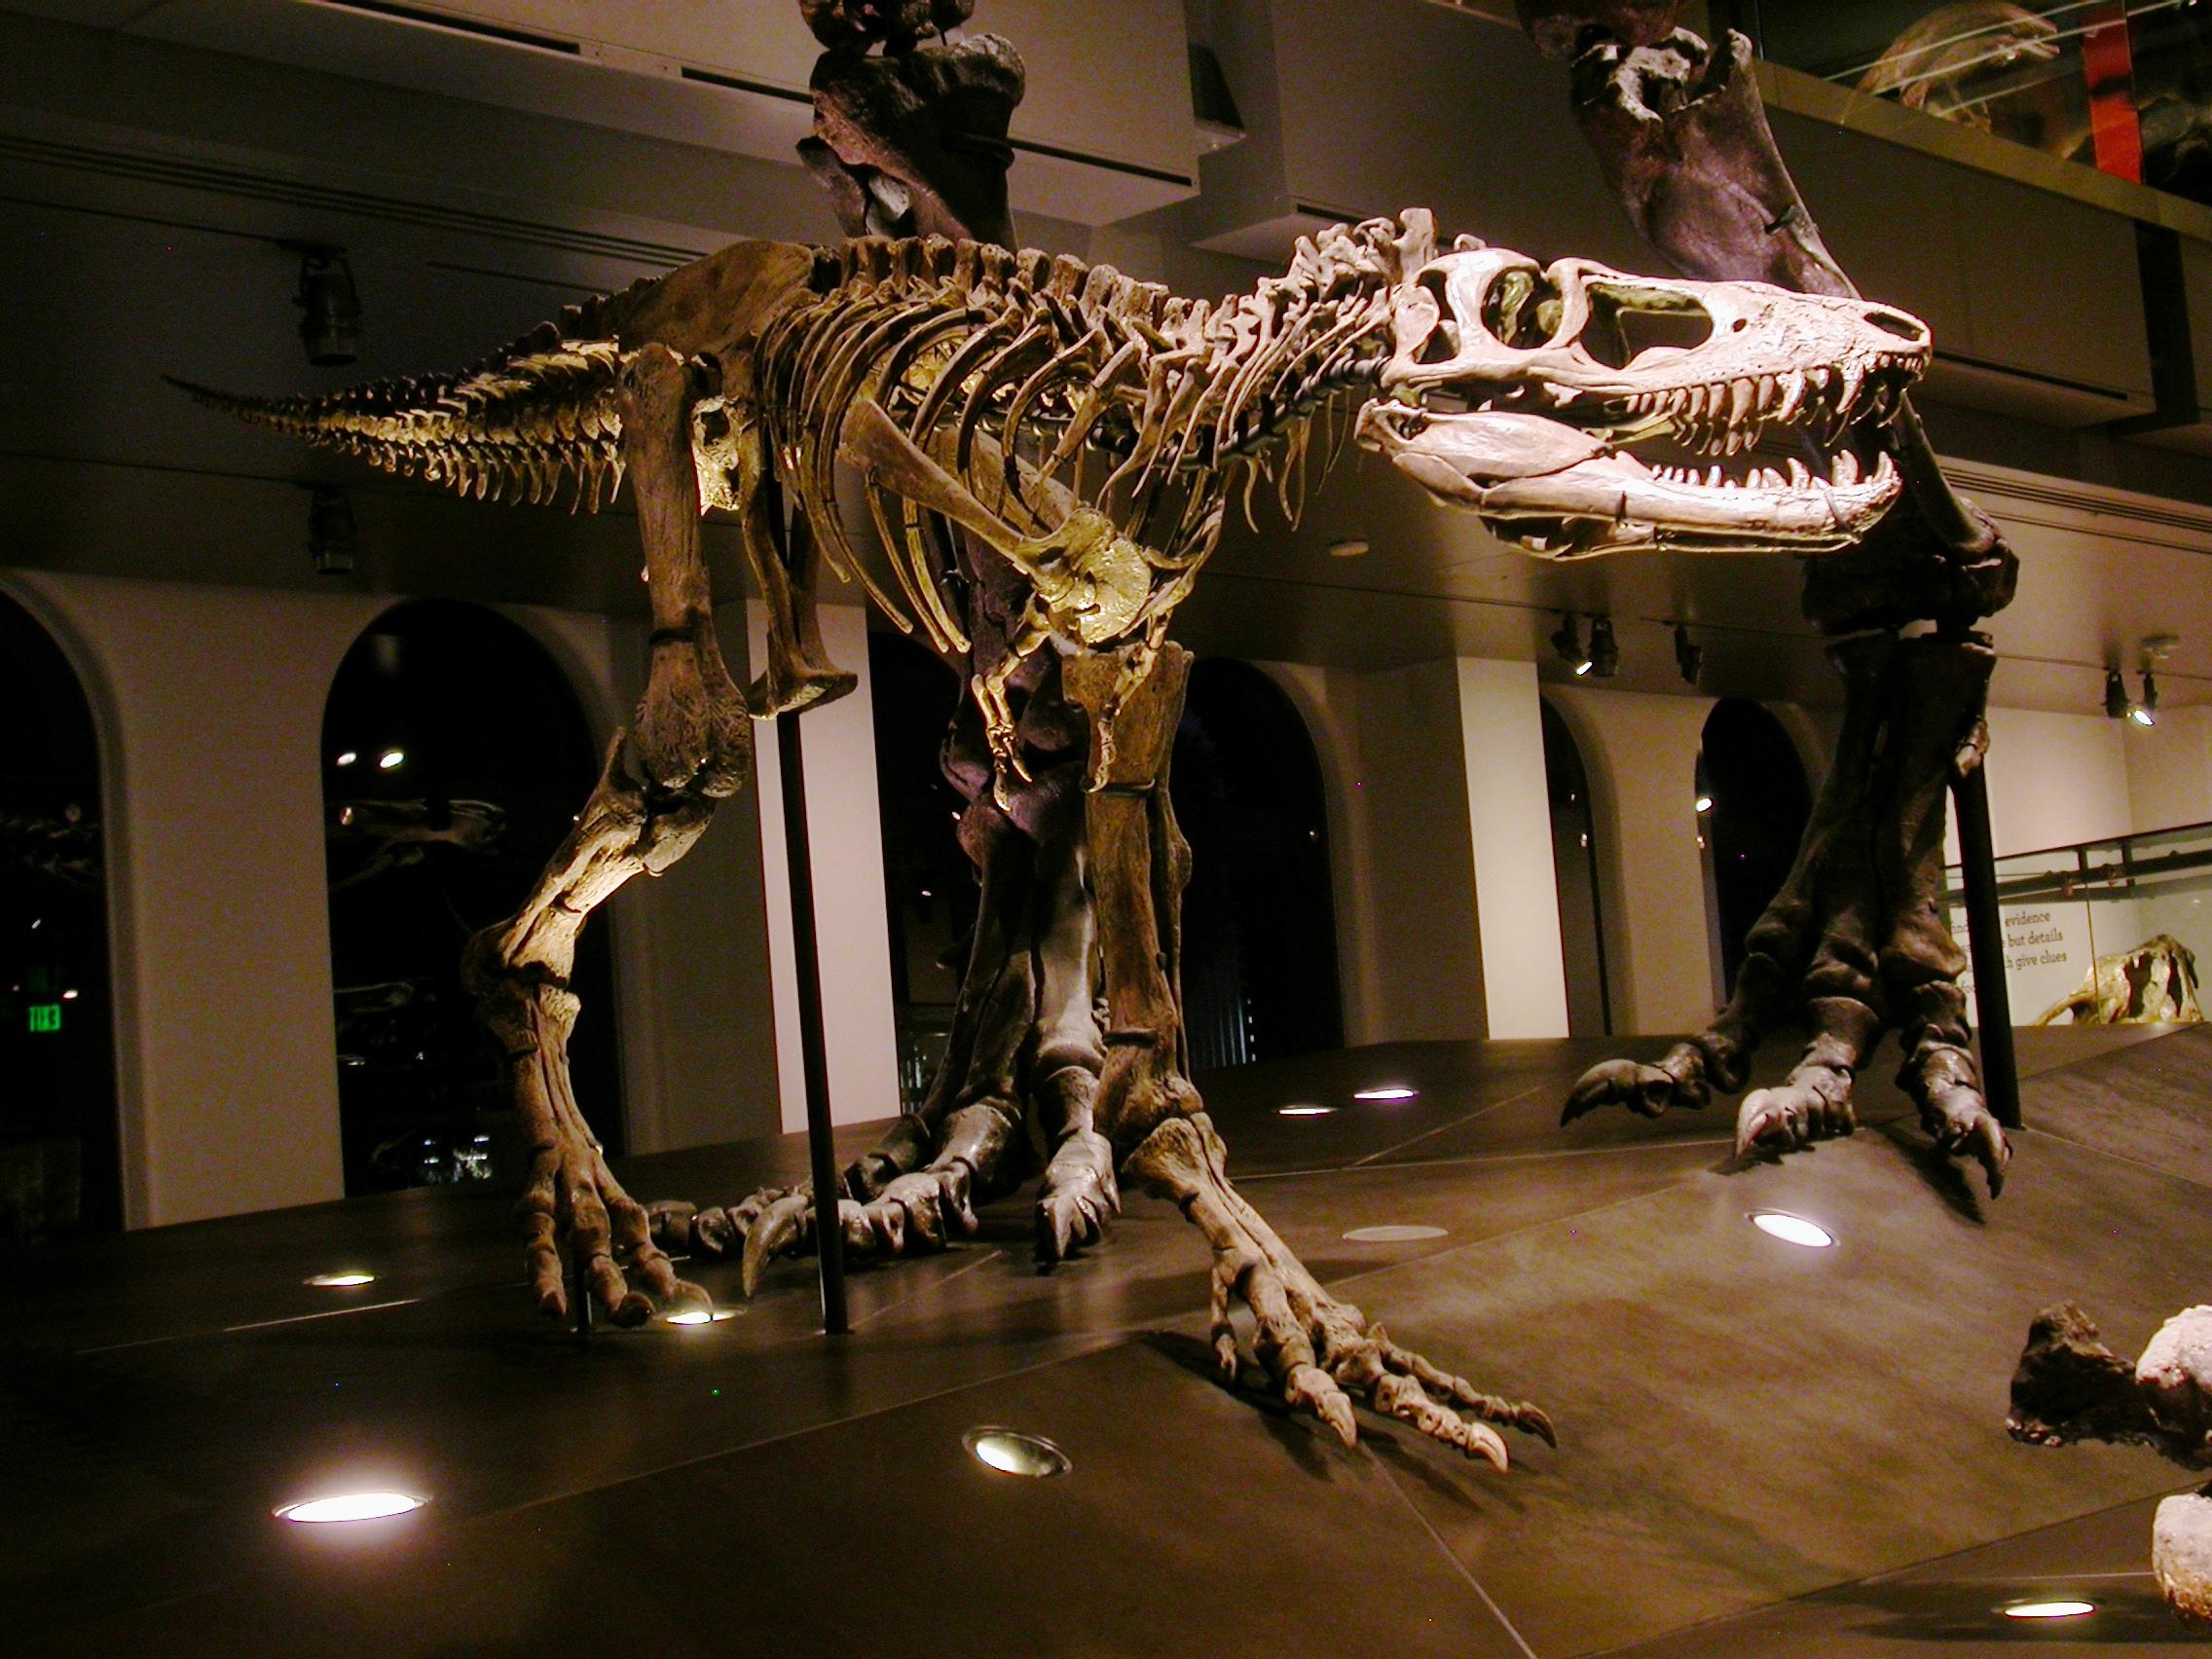 LACM dino camp 8 - baby rex